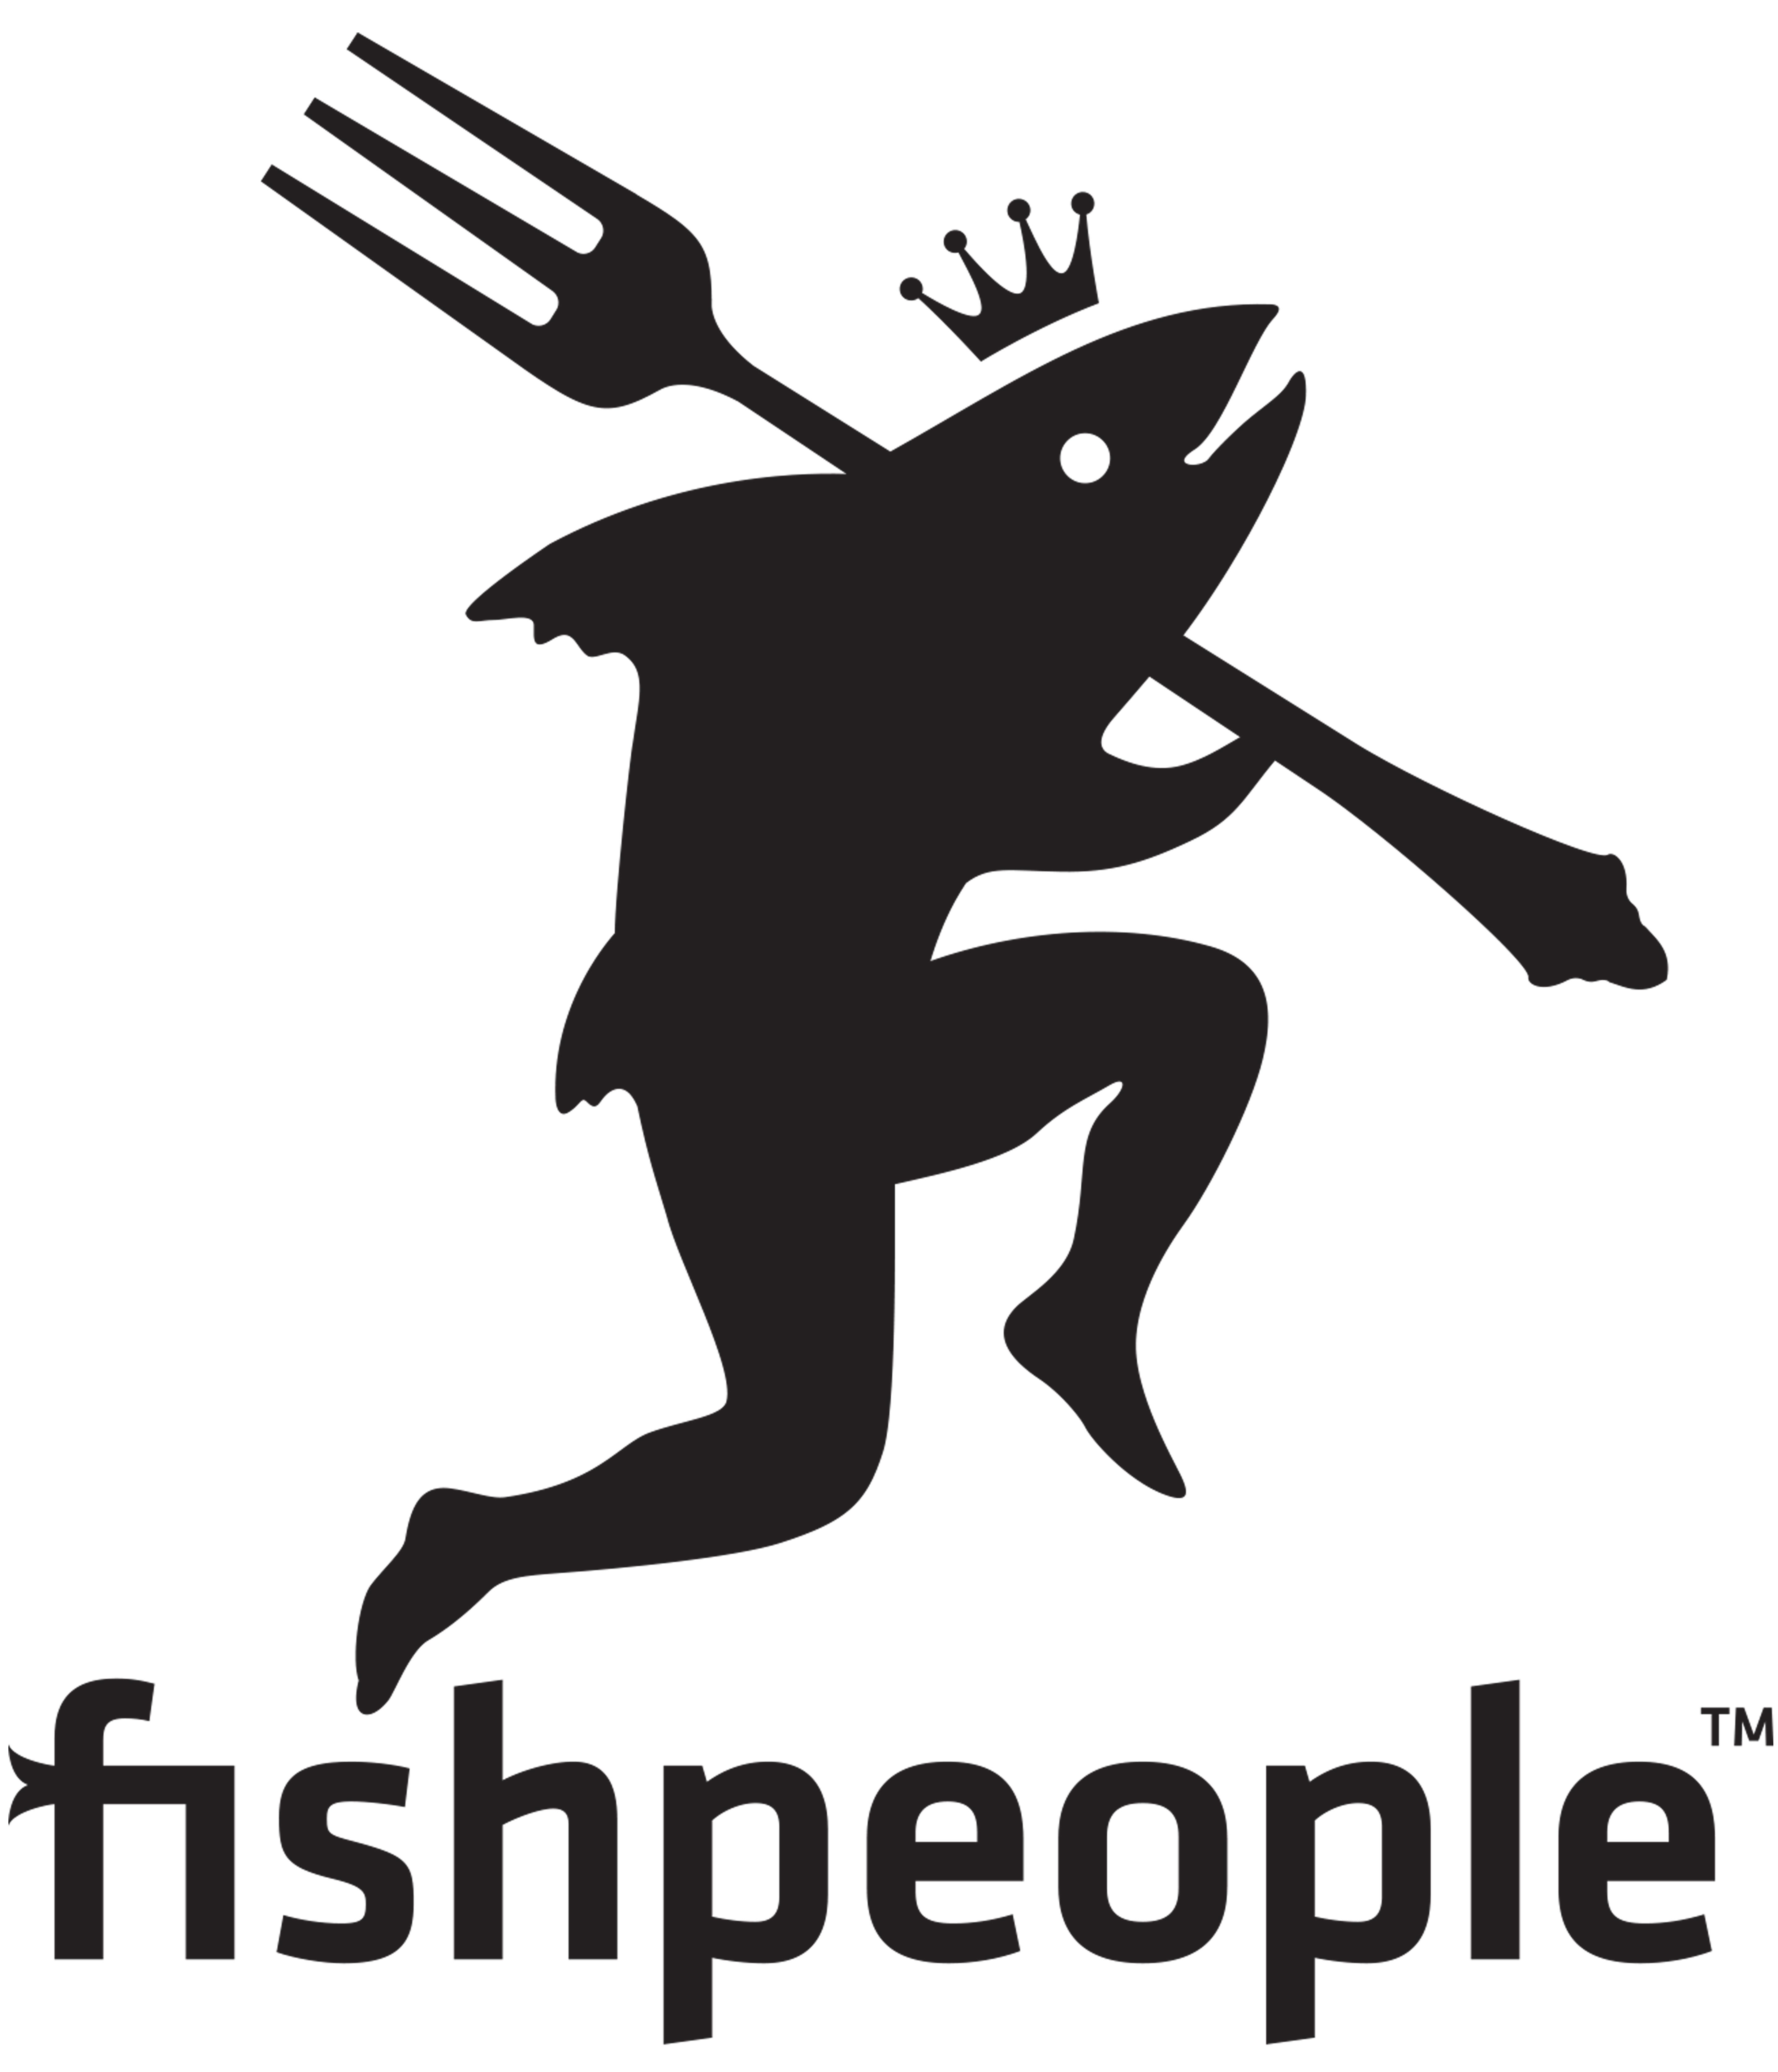 Fishpeople